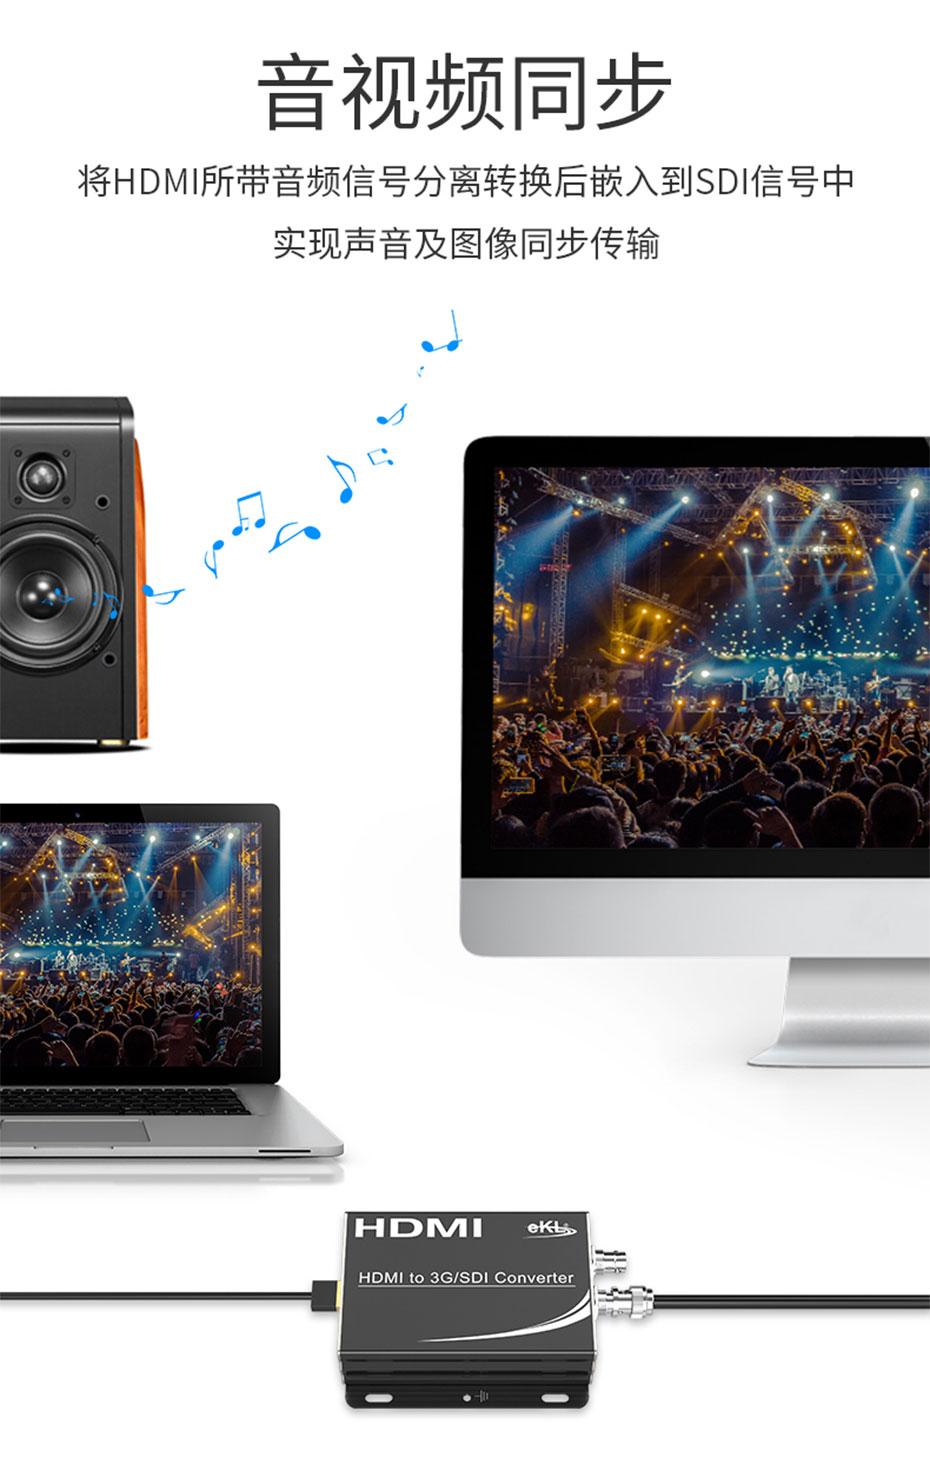 HDMI转SDI转换器HSD支持音频和视频同步传输